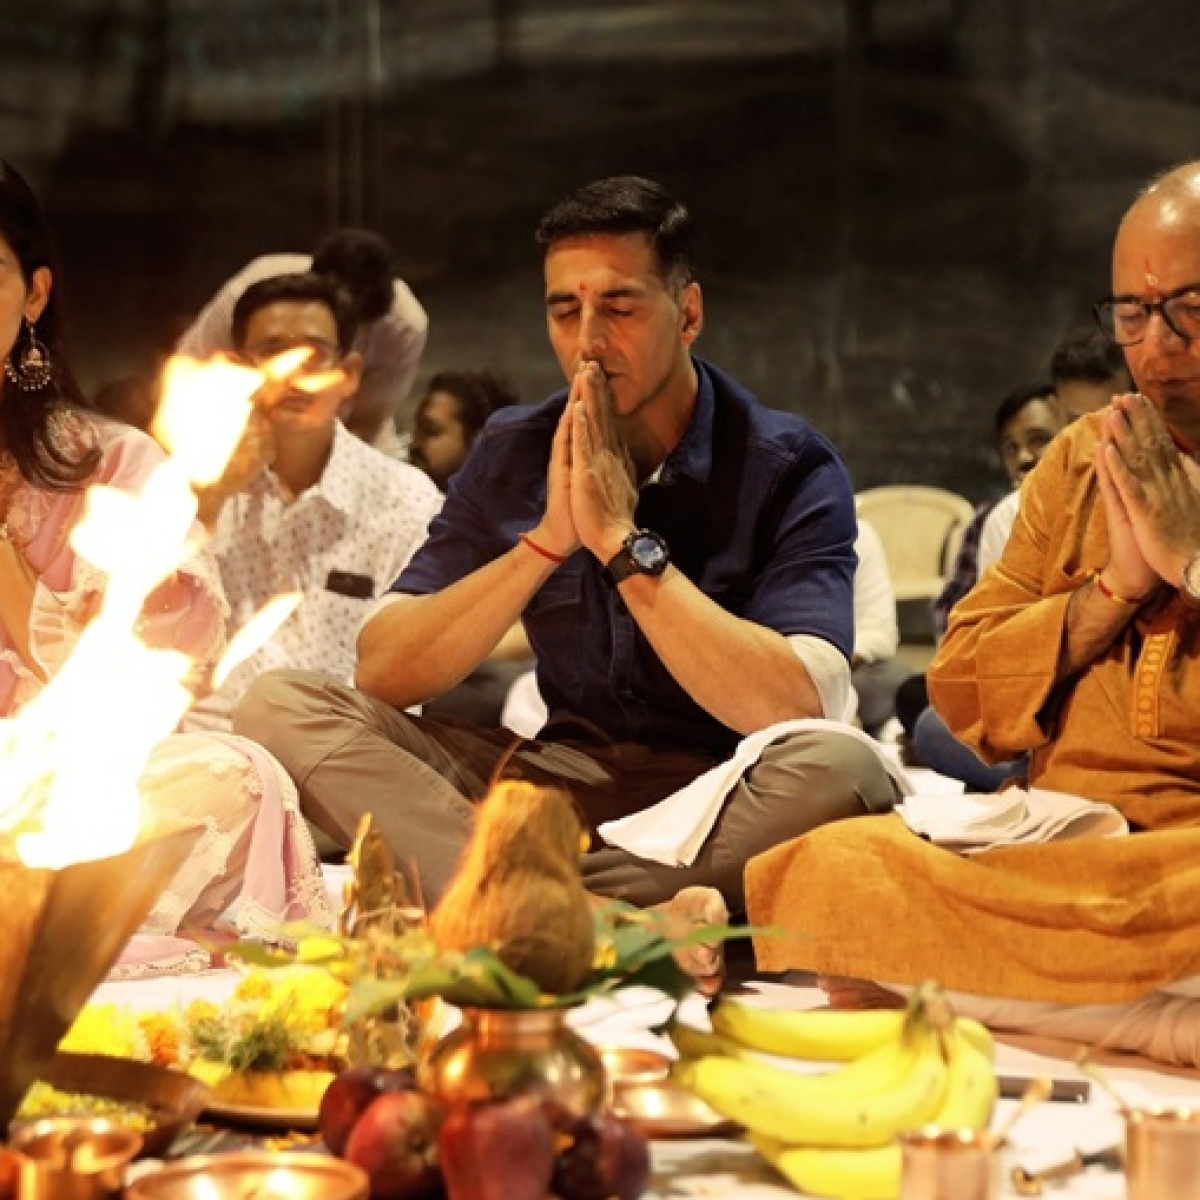 Video: Akshay Kumar, Manushi Chillar perform puja as 'Prithviraj' shooting begins soon